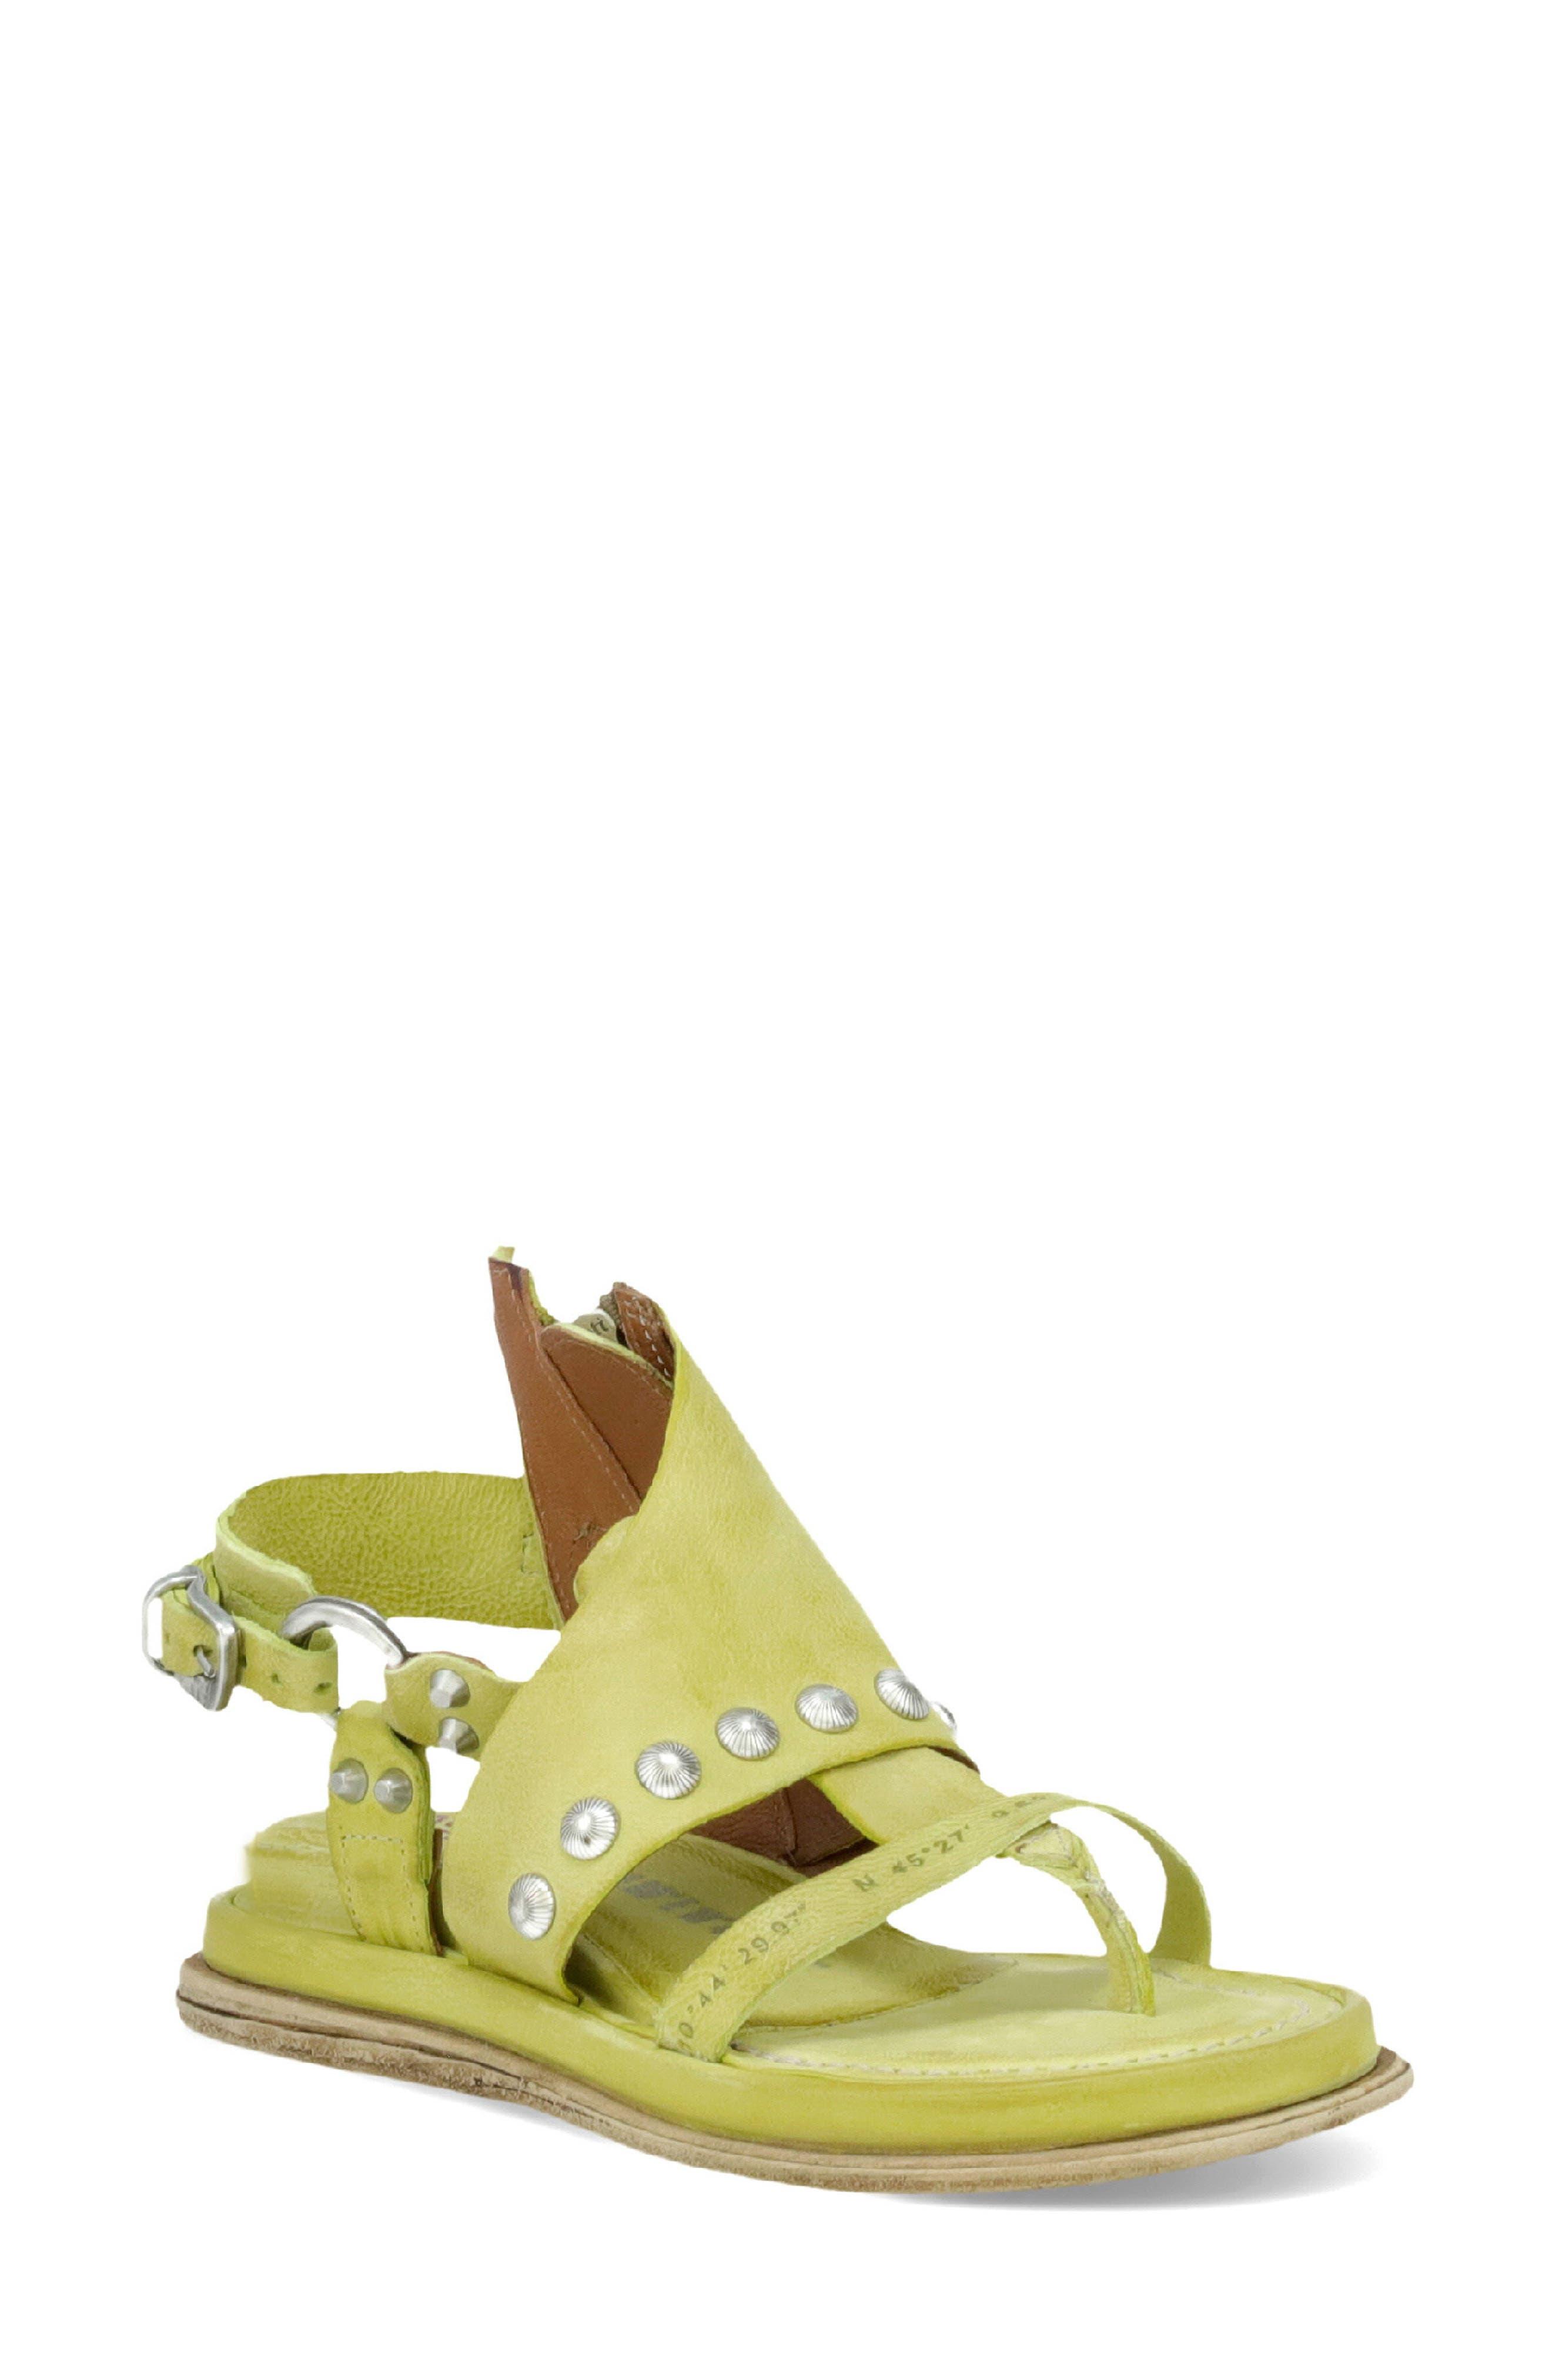 Women's A.s.98 Pacey Sandal